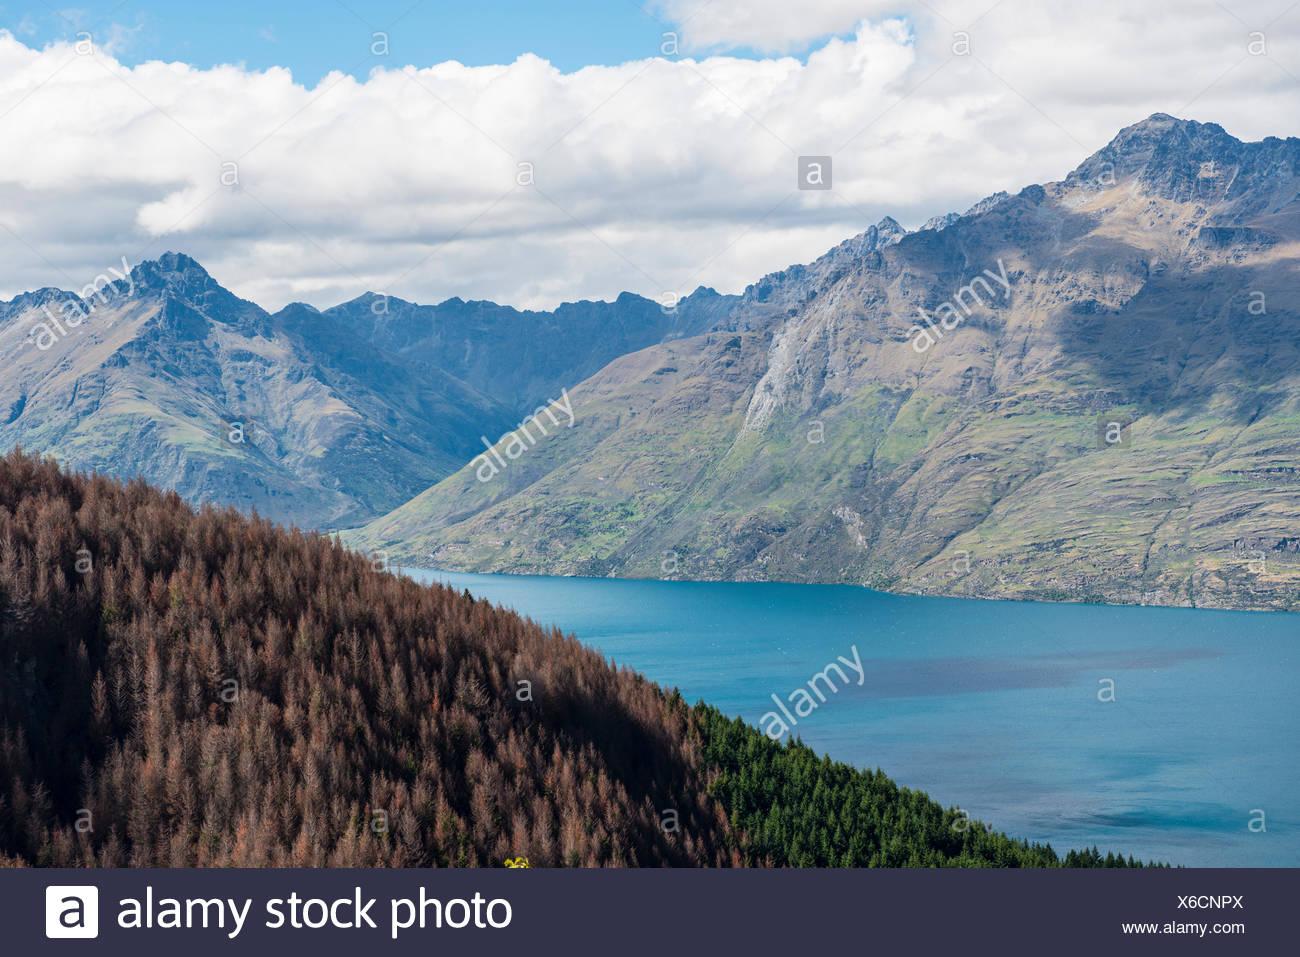 View of Lake Wakatipu, Ben Lomond, Otago, South Island, New Zealand - Stock Image